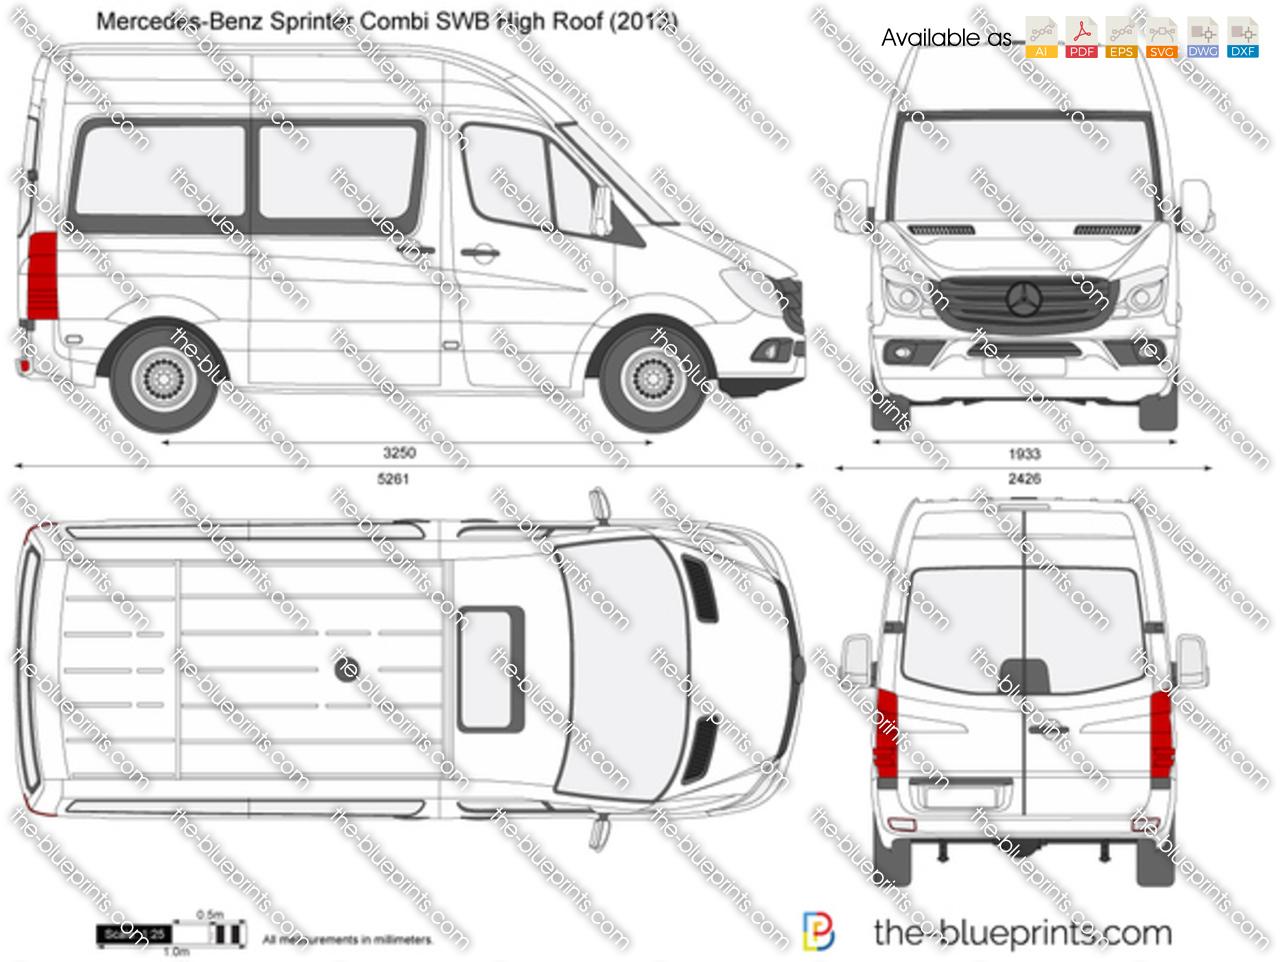 Mercedes Benz Sprinter Combi Swb High Roof Vector Drawing